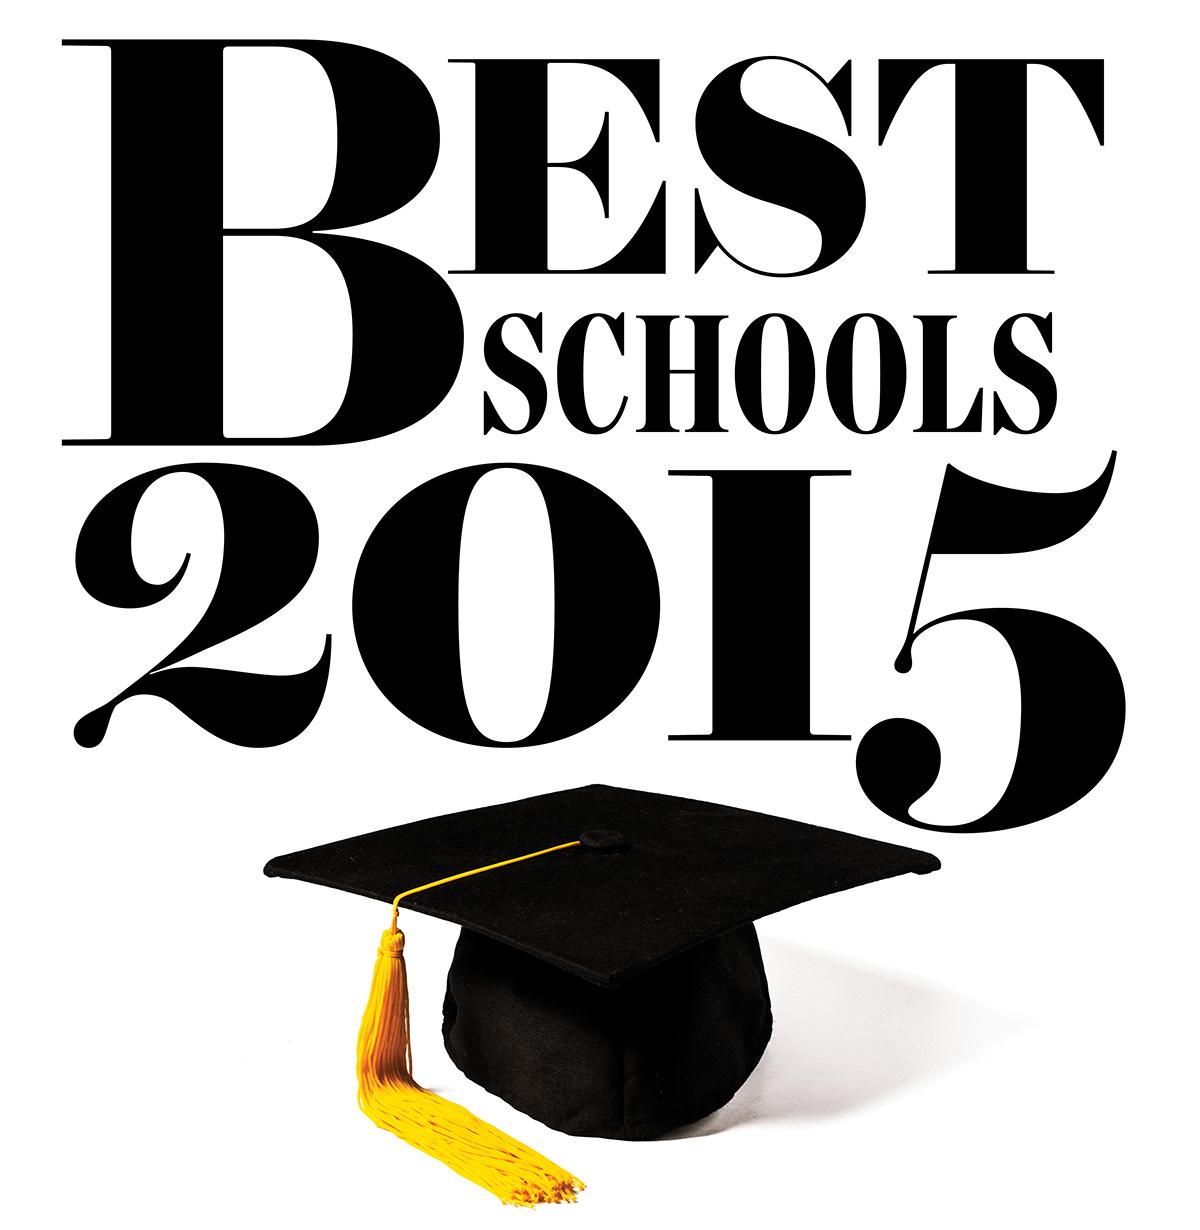 best schools boston